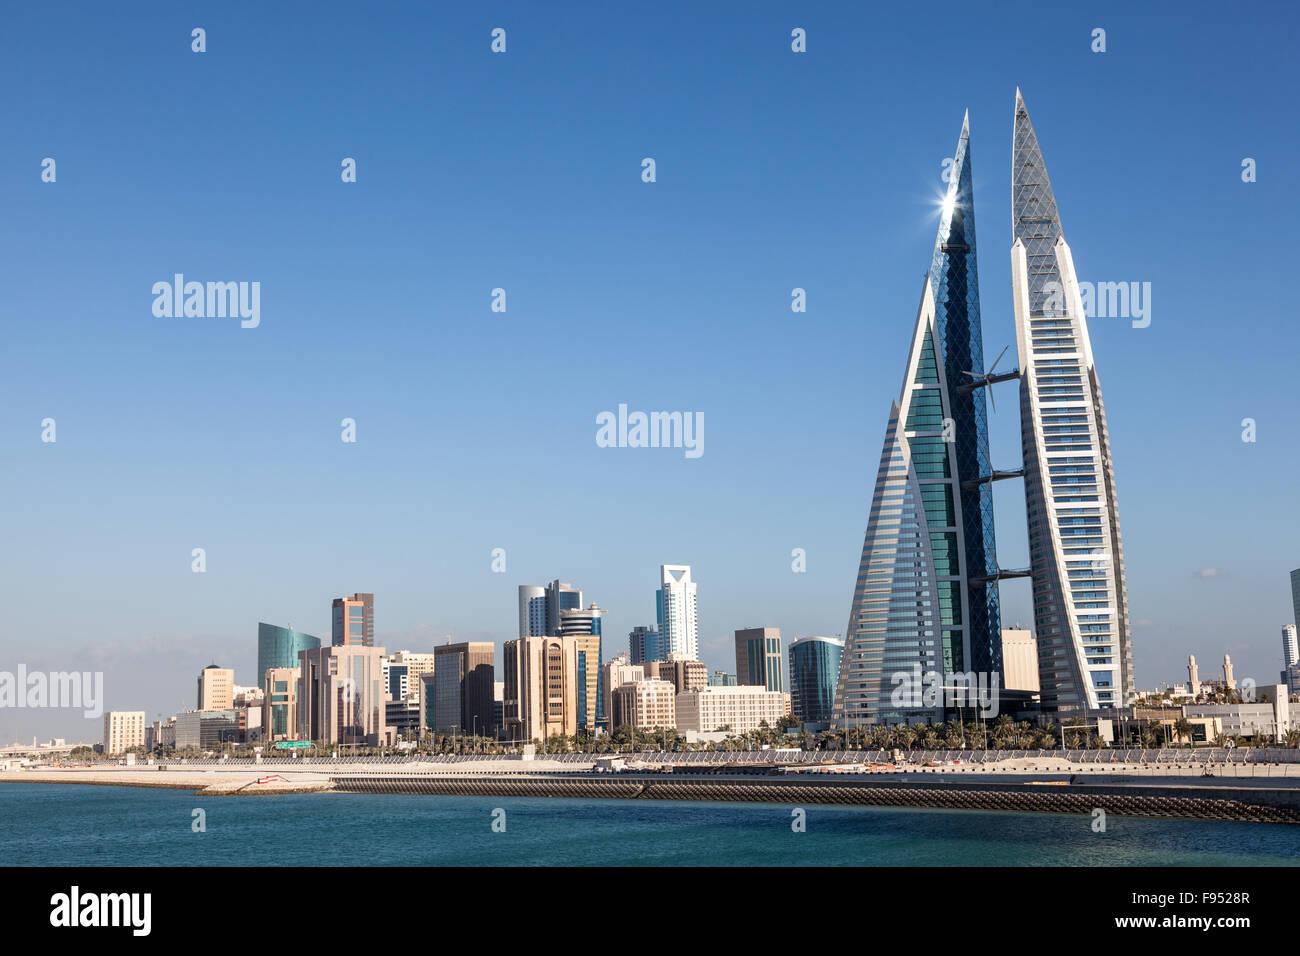 Bahrain World Trade Center - Stock Image